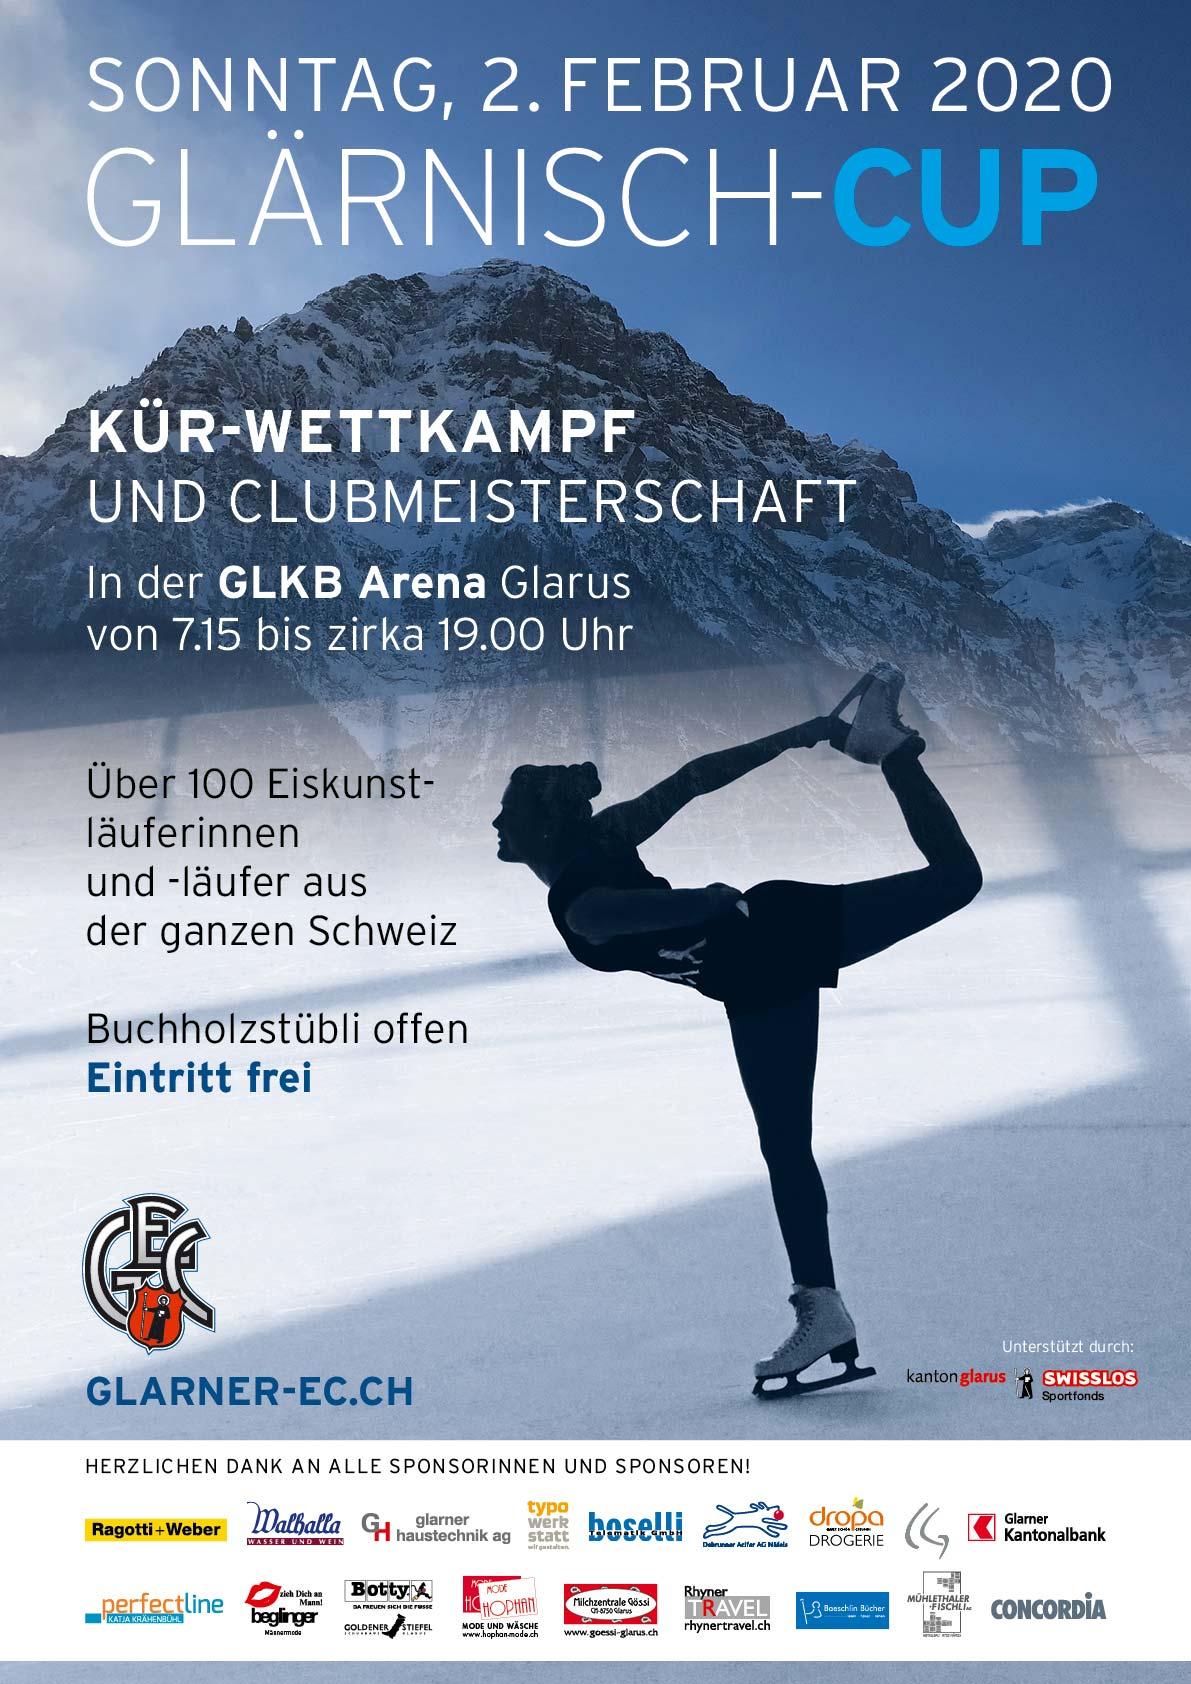 glaernisch-cup-2020-plakat